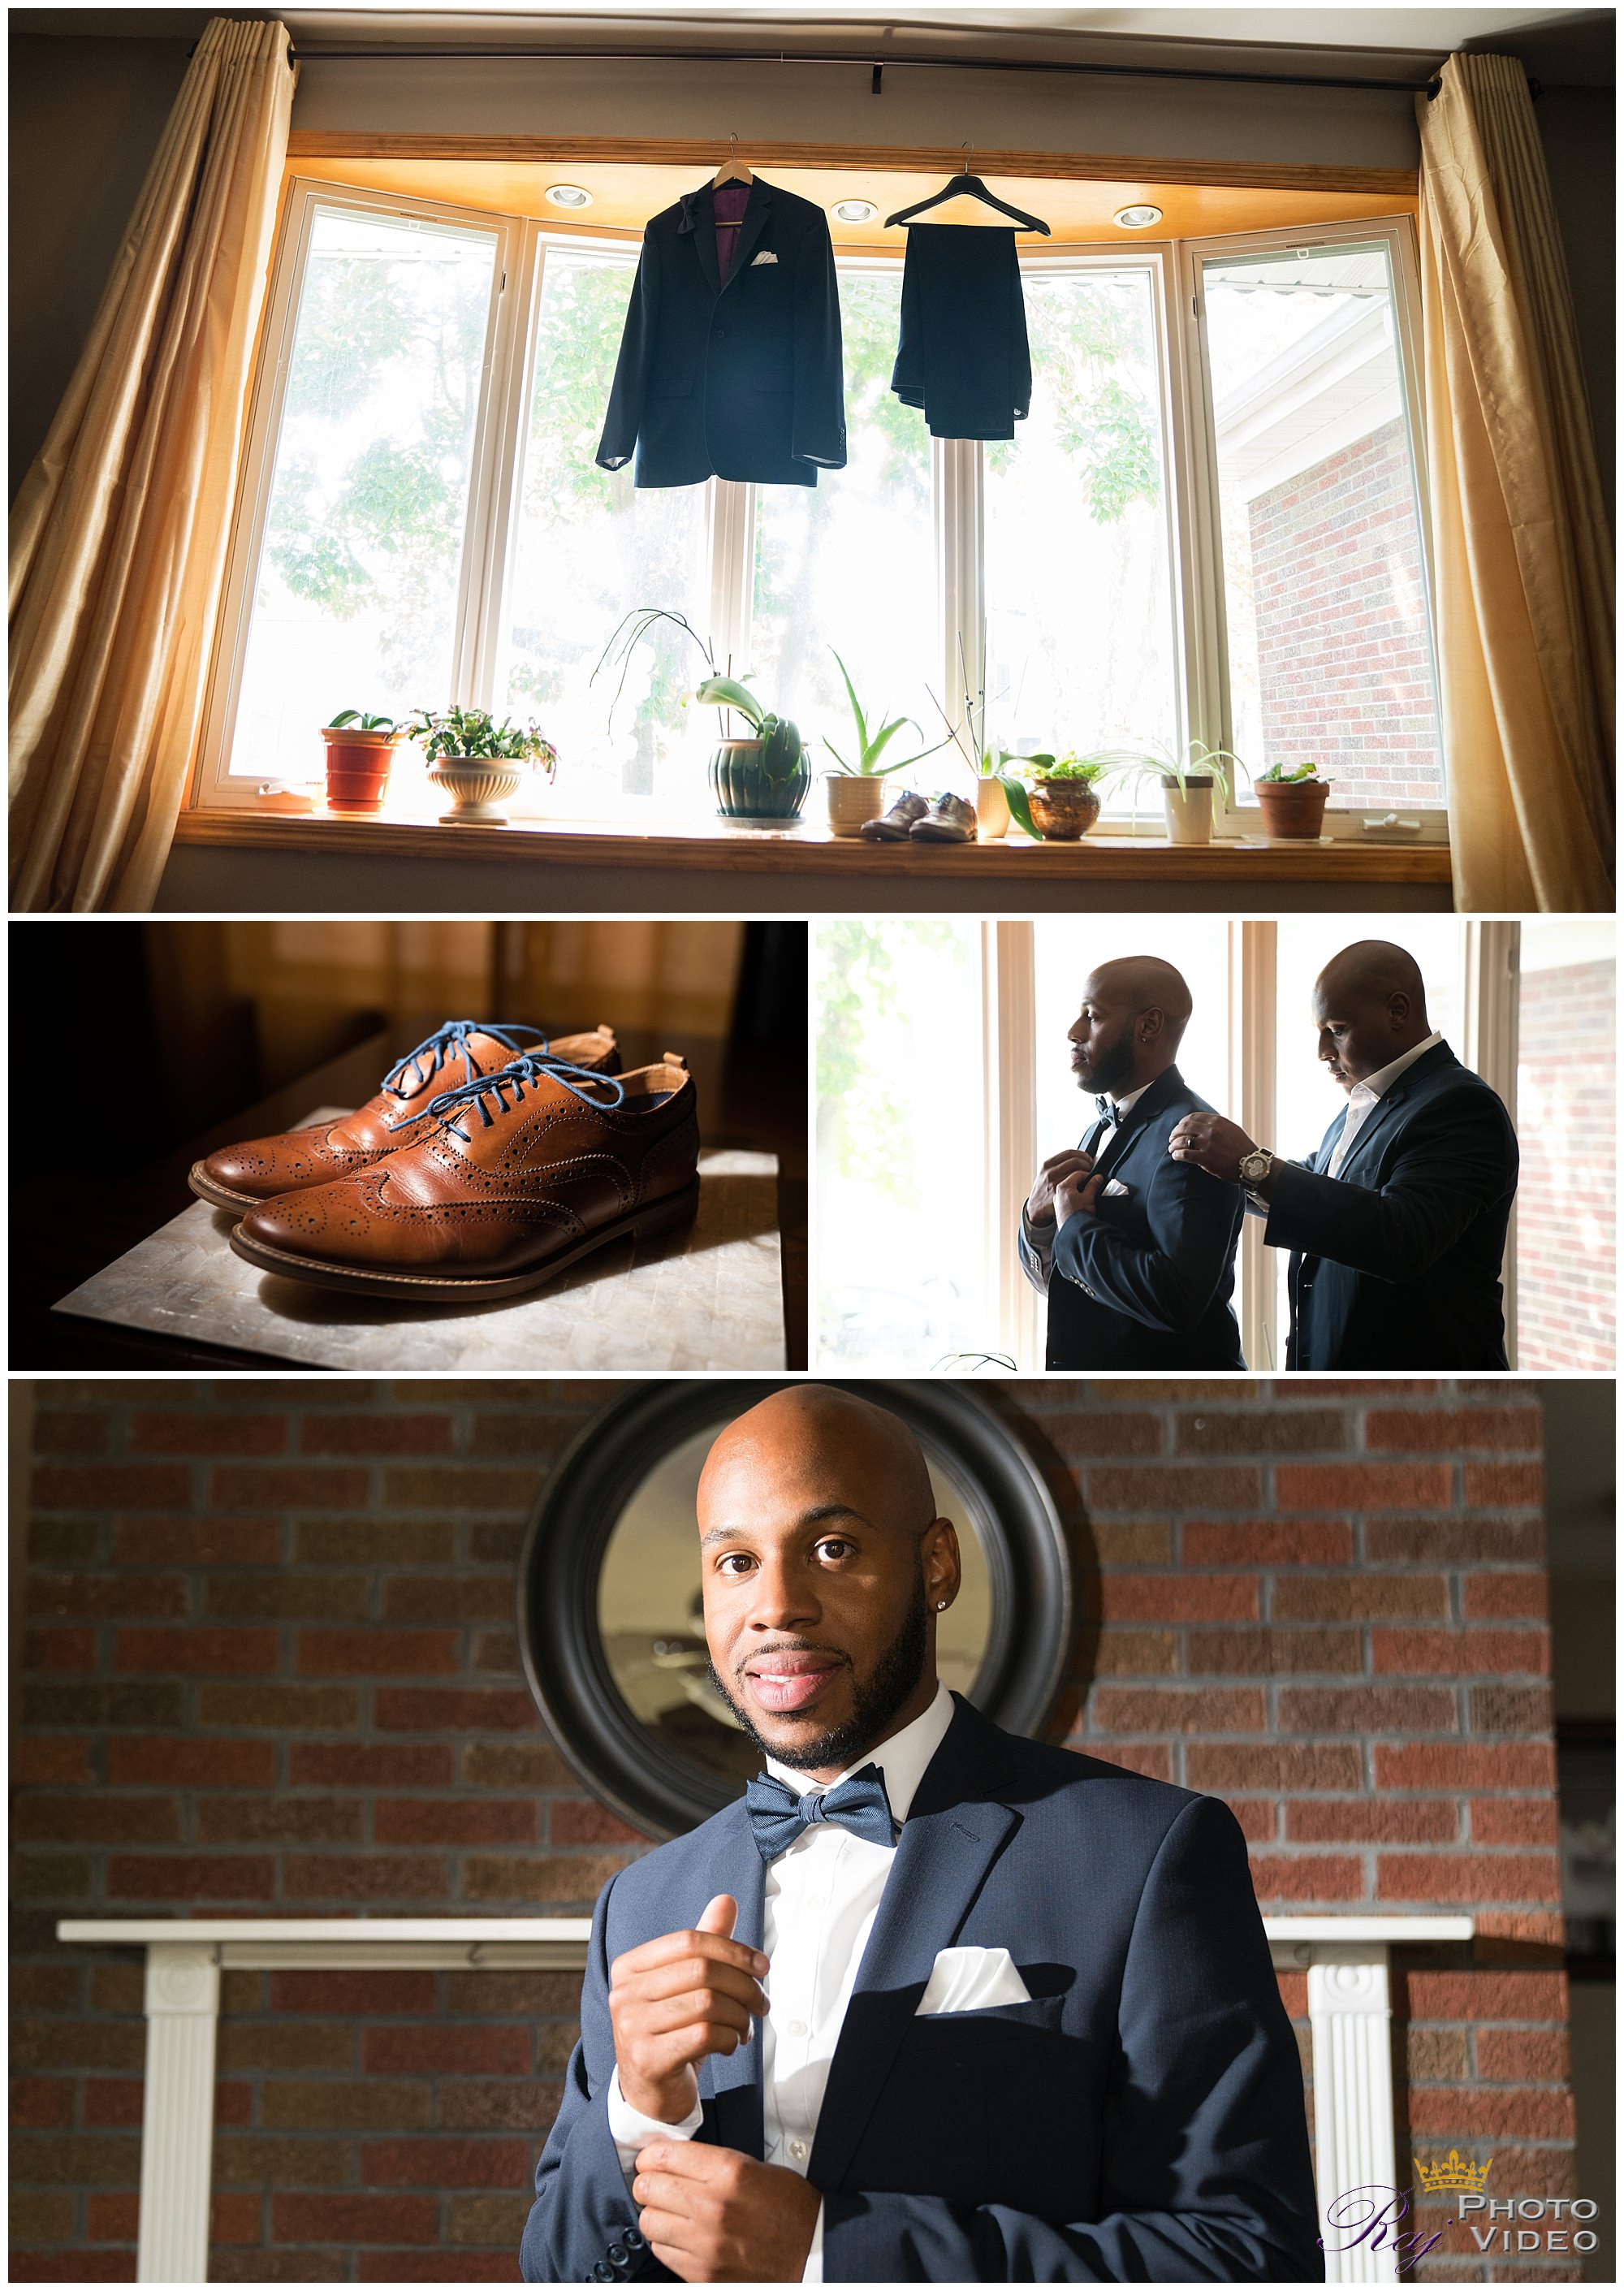 The-Armory-Perth-Amboy-NJ-Catholic-Wedding-Yudelkis-Stephen-4.jpg